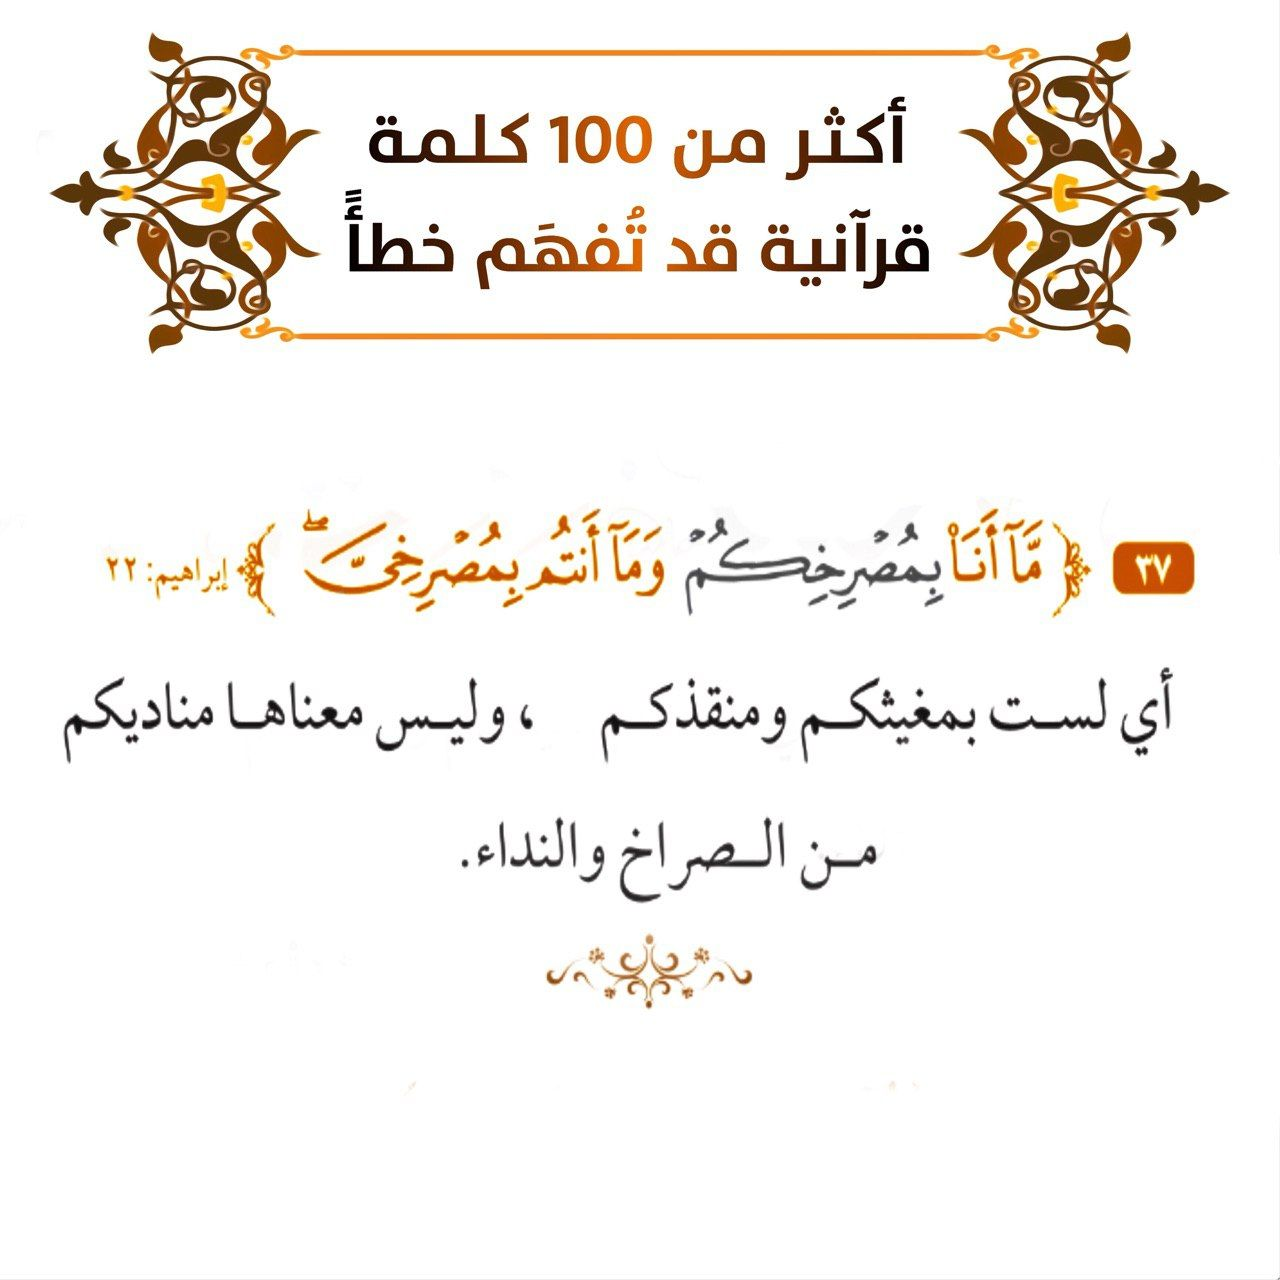 Pin By إلتزآم رودينا On آيات Wisdom Quotes Life Quran Verses Islamic Quotes